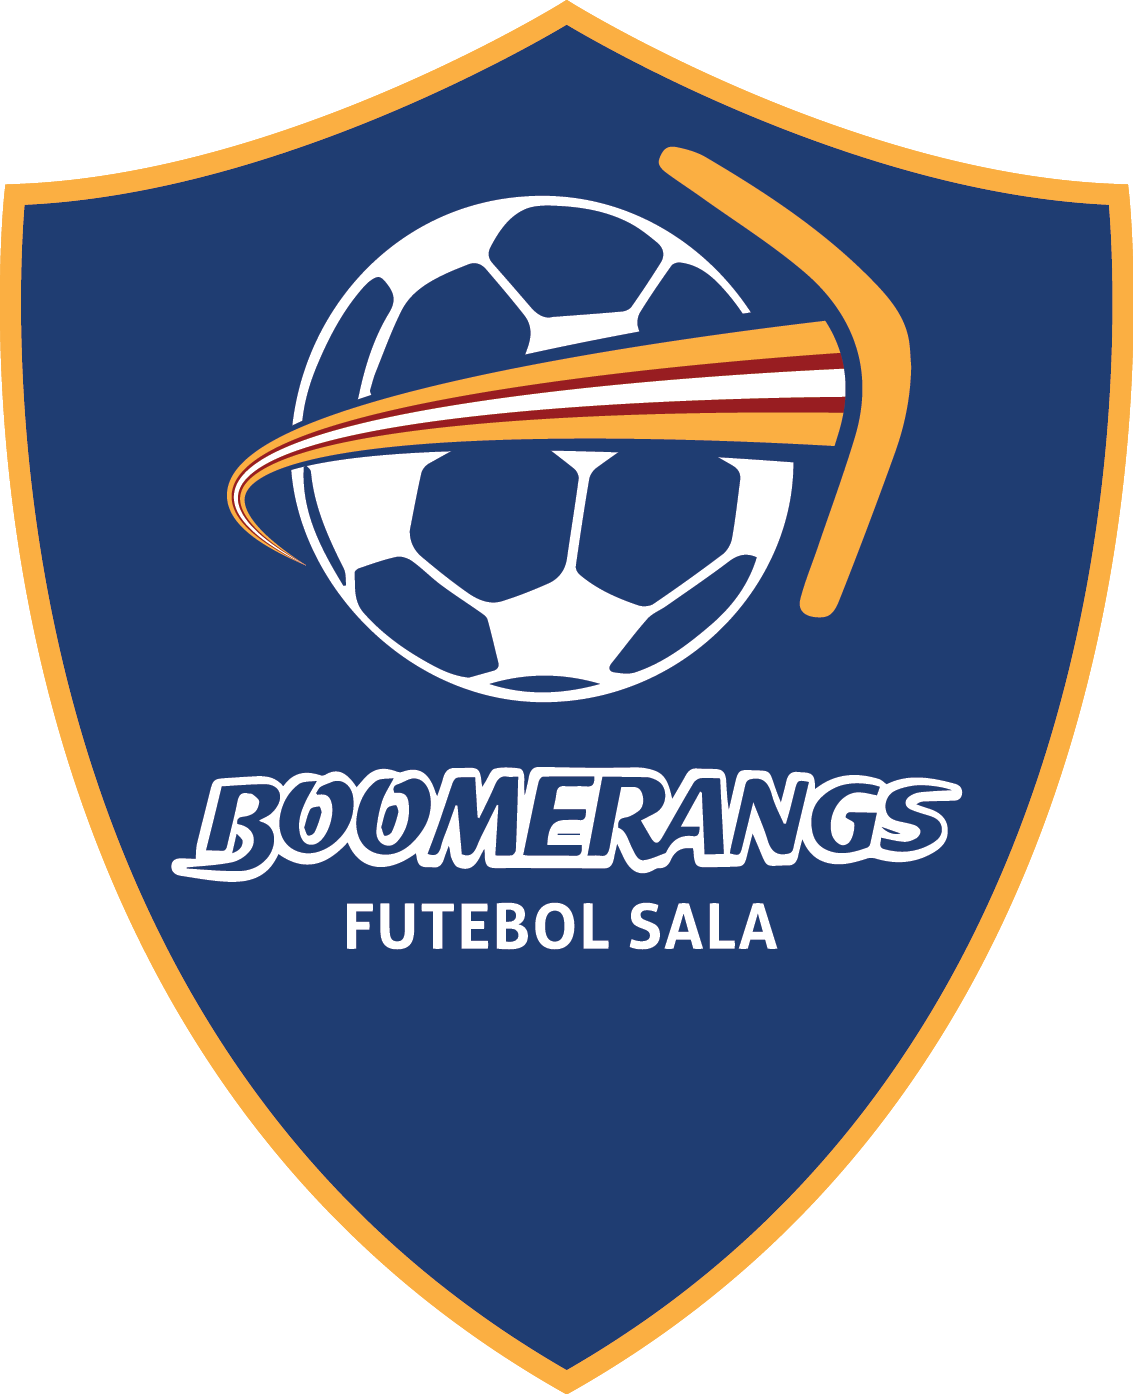 Boomerangs FS